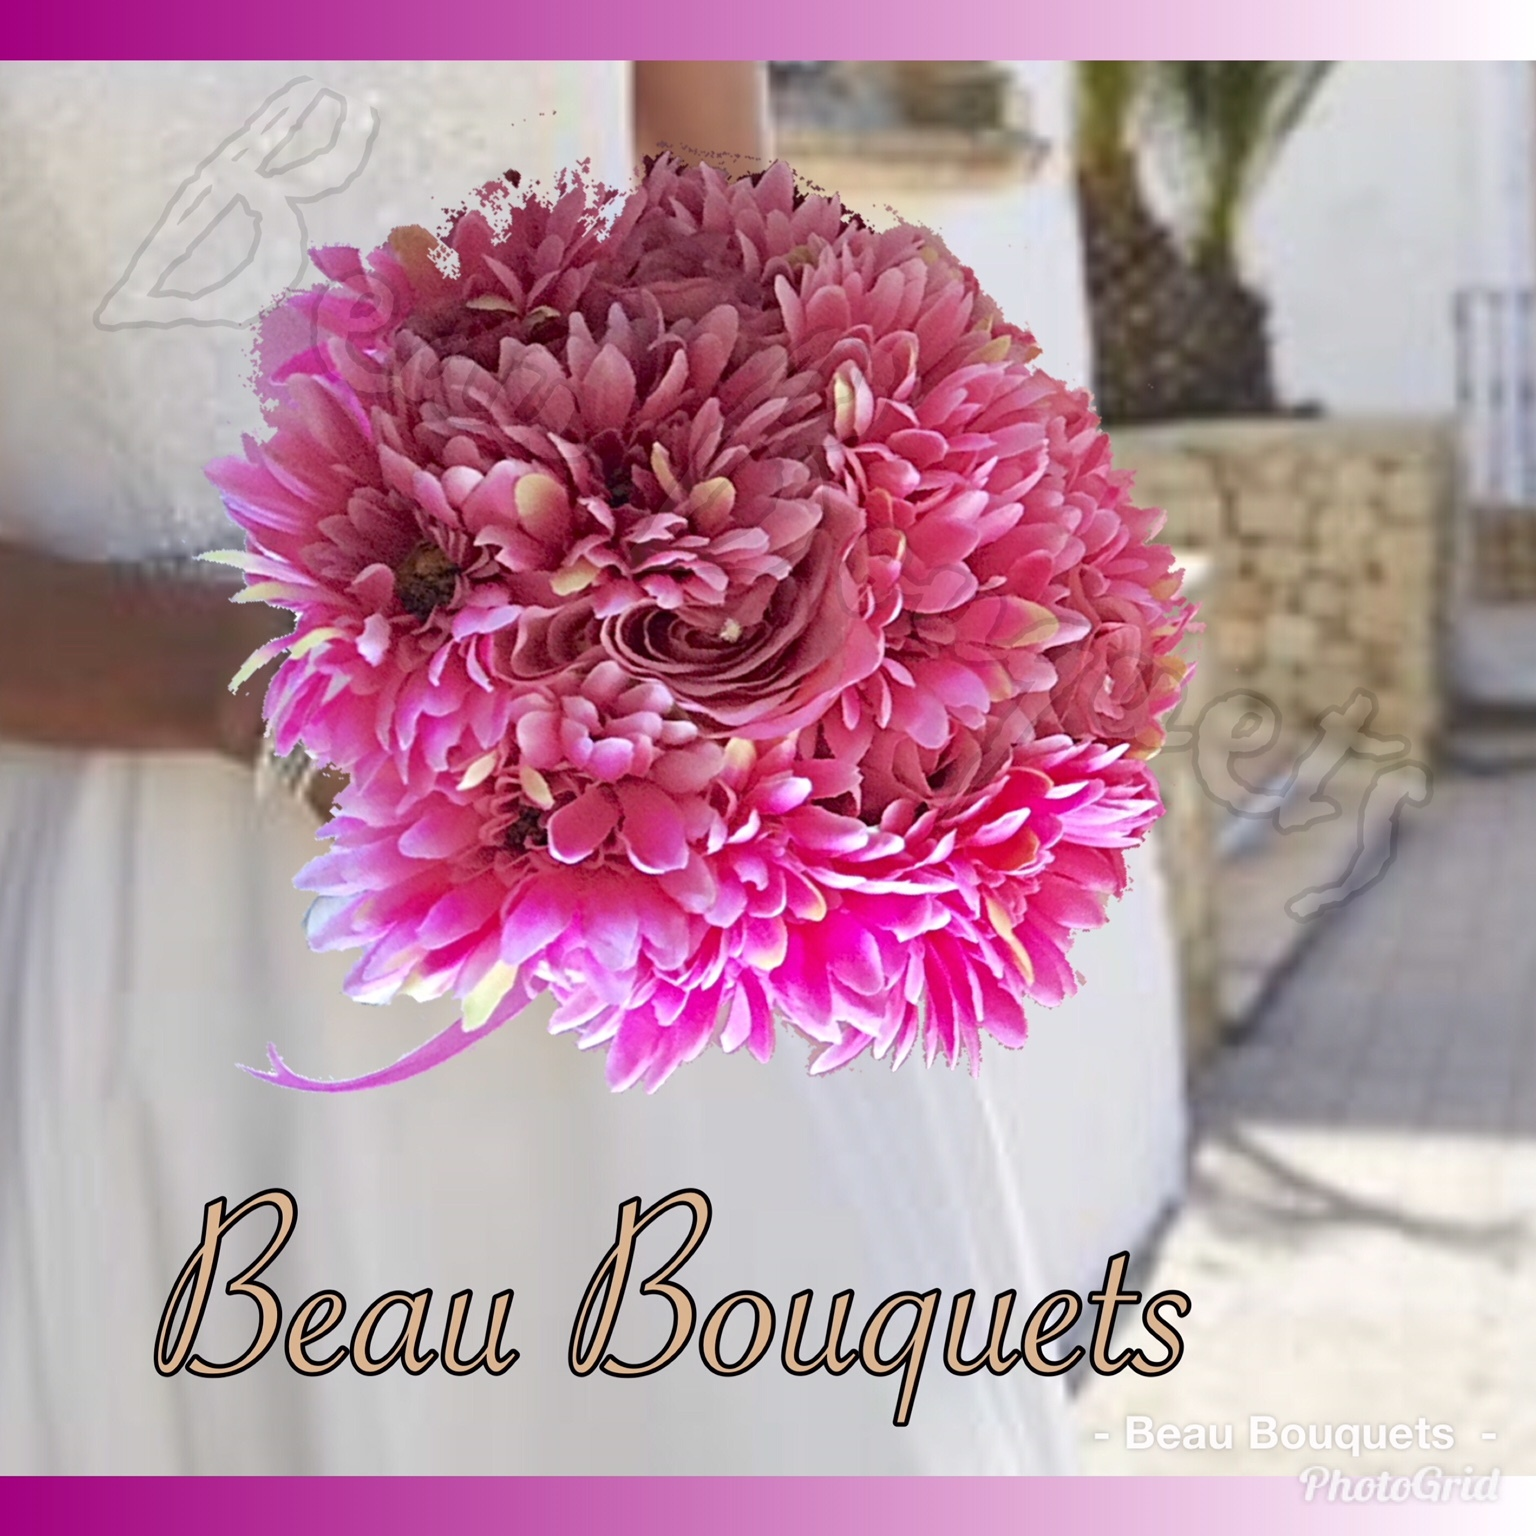 SWEET SUGAR ROUND BRIDE BOUQUET Cerise & bright pinks with white gerberas